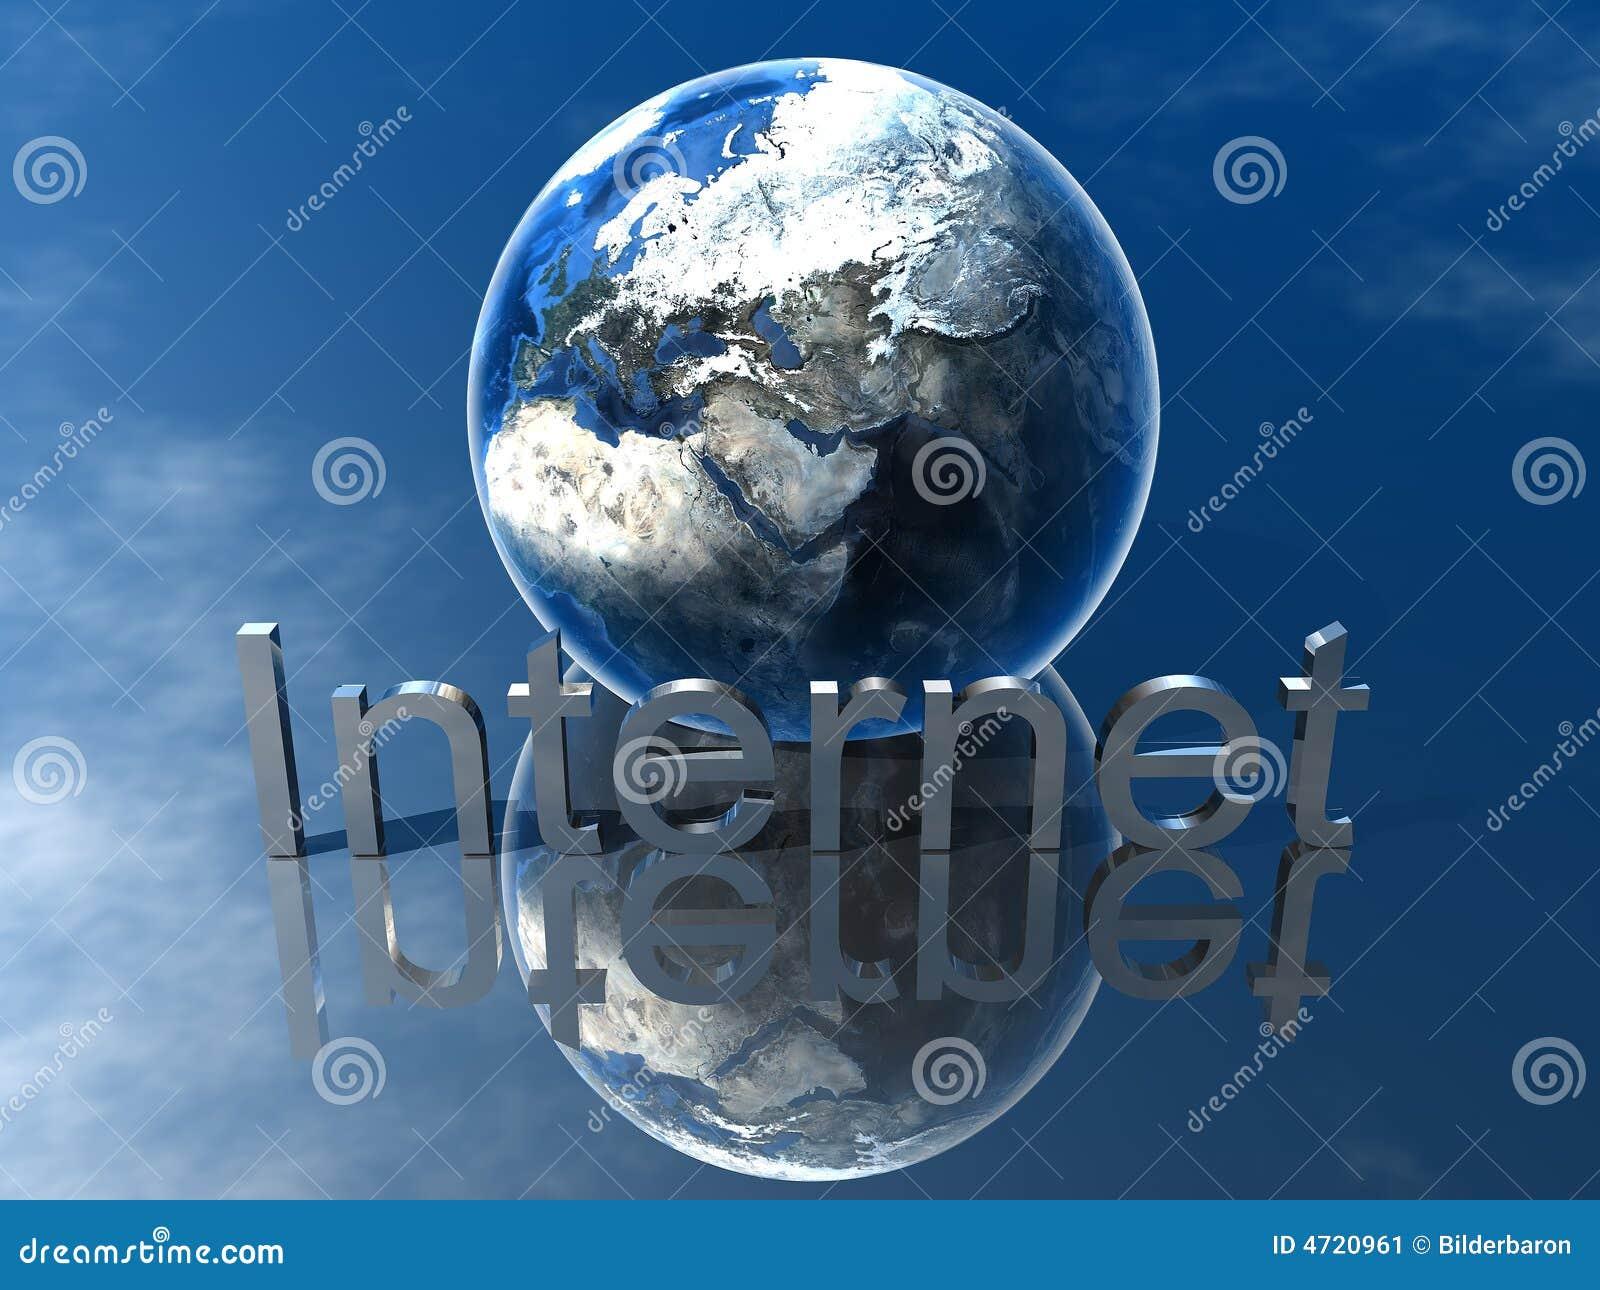 logo-internet-4720961.jpg